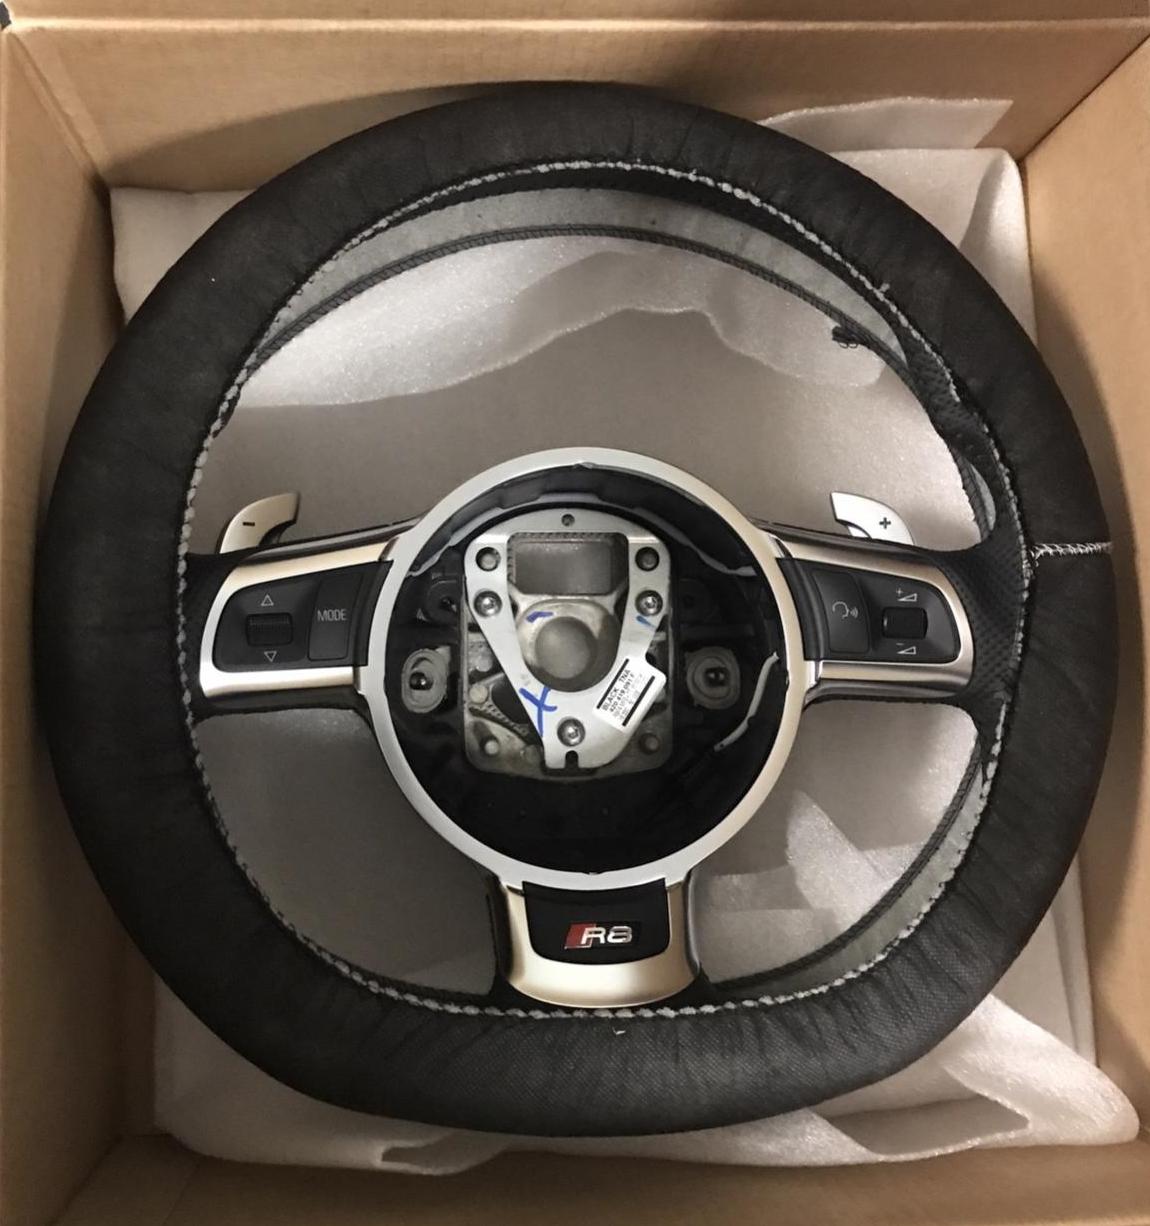 Poza 6 - Comenzi Volan AUDI RS3 RS4 RS5 RS6 TTRS A8 R8 420951527A / 420 951 527 A